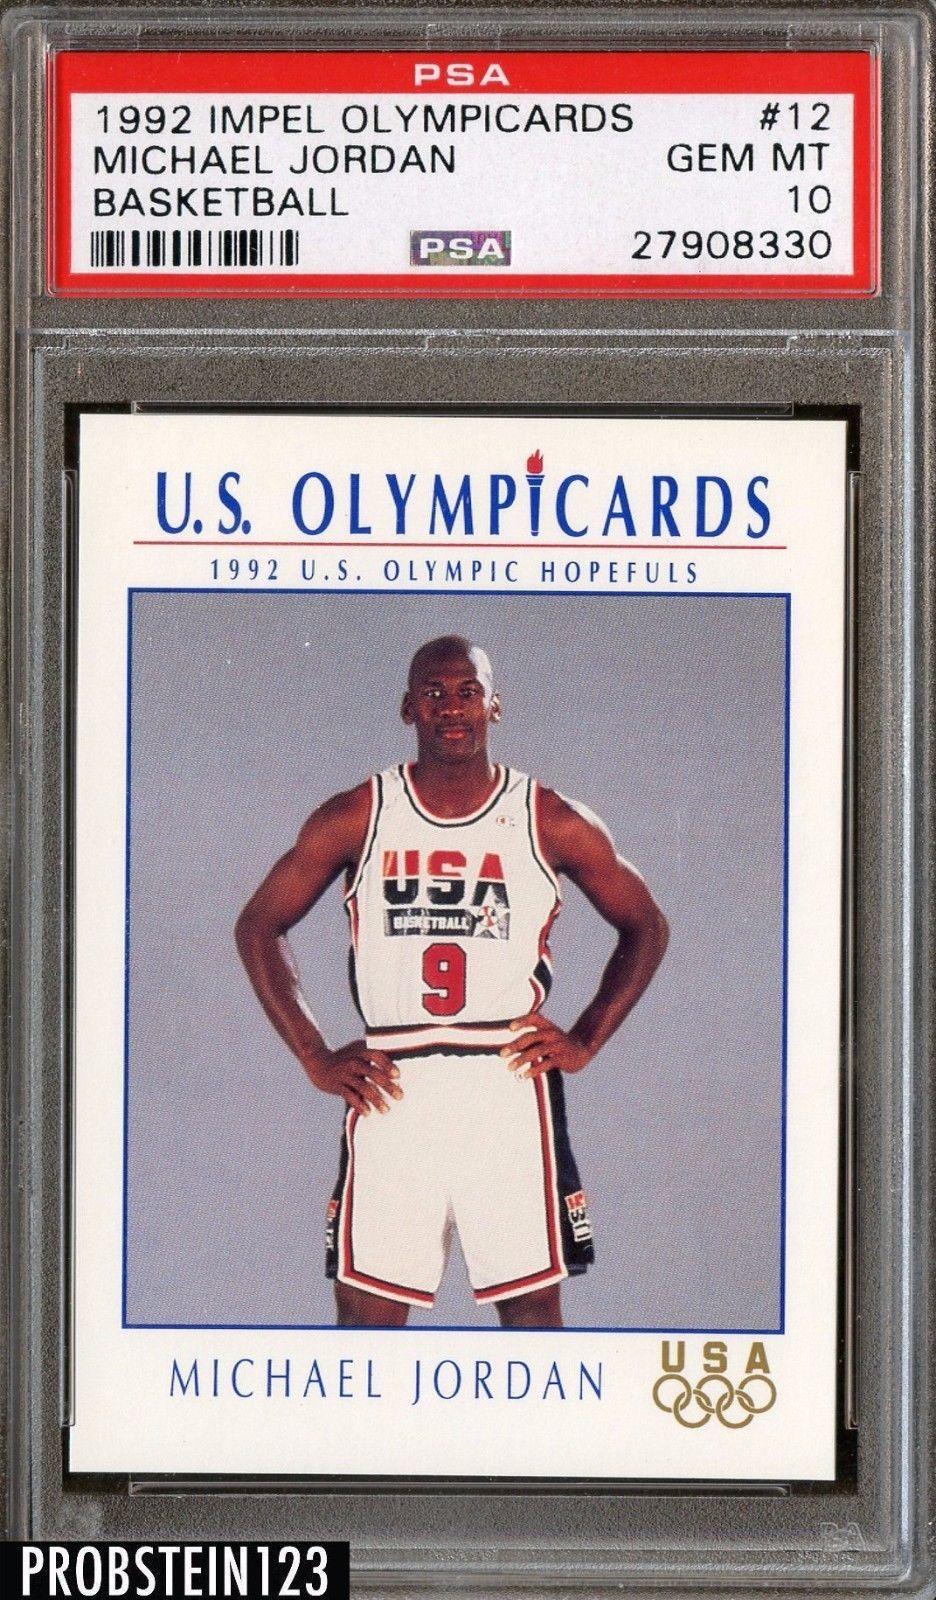 1992 impel olympicards basketball 12 michael jordan dream